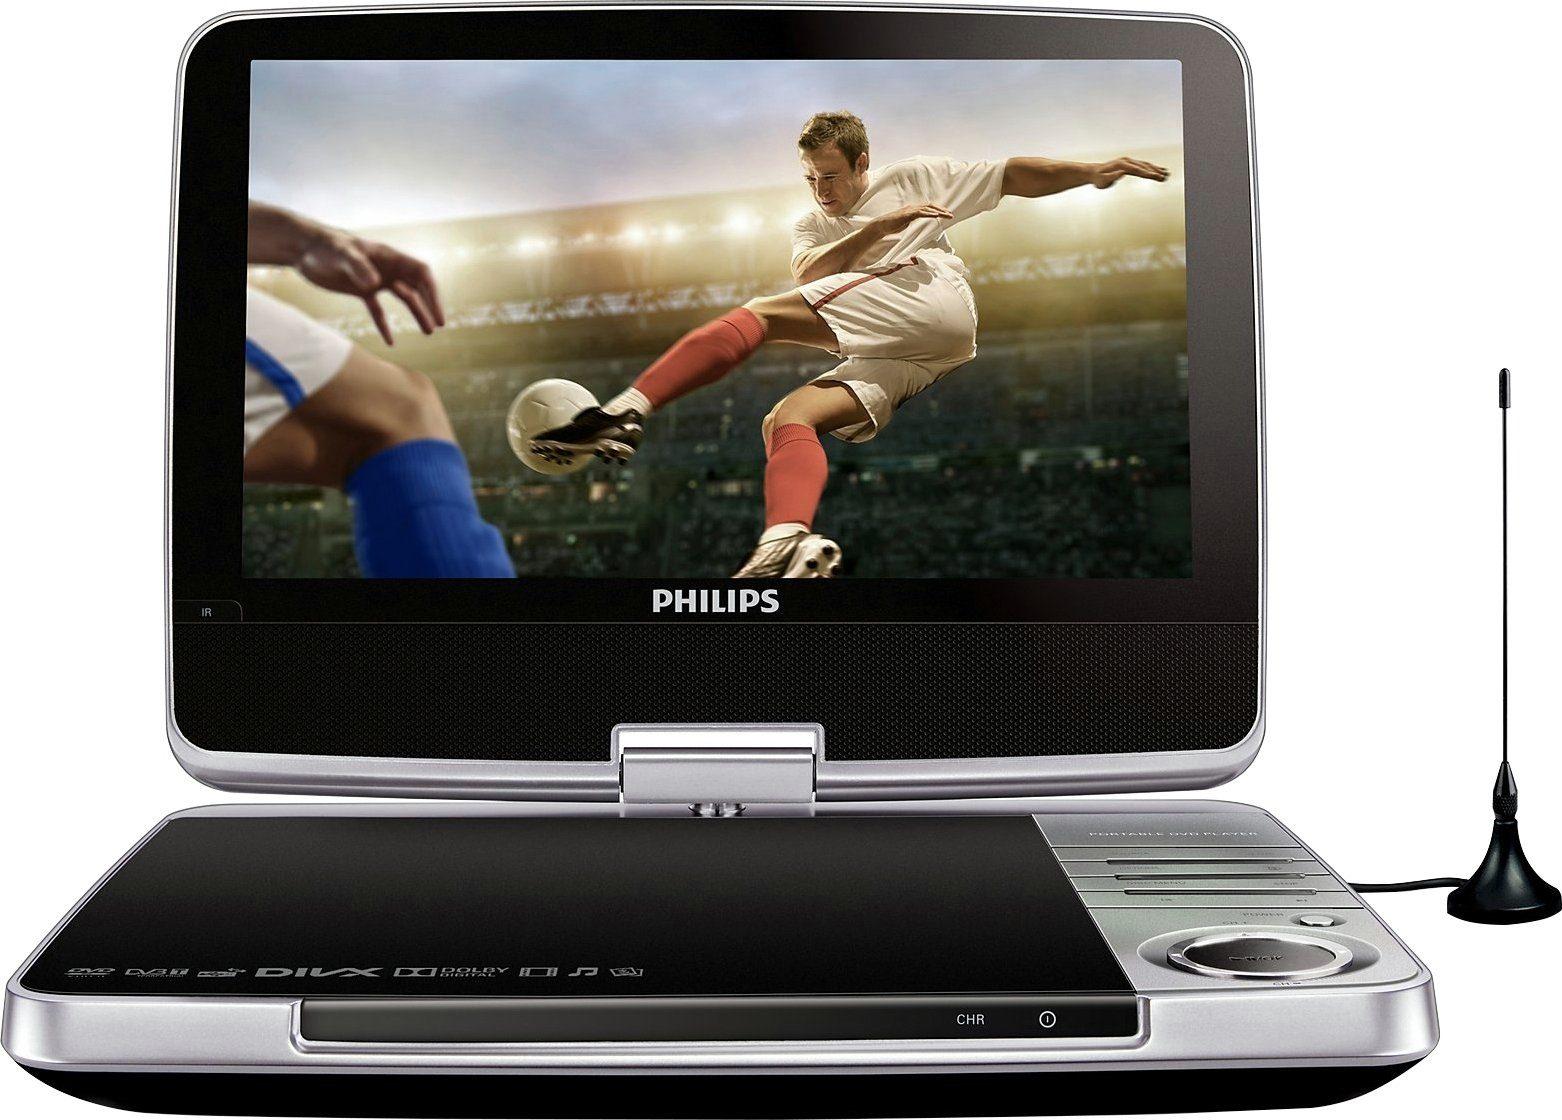 Philips PD9025 tragbarer DVD-Player & Fernseher, DVB-T